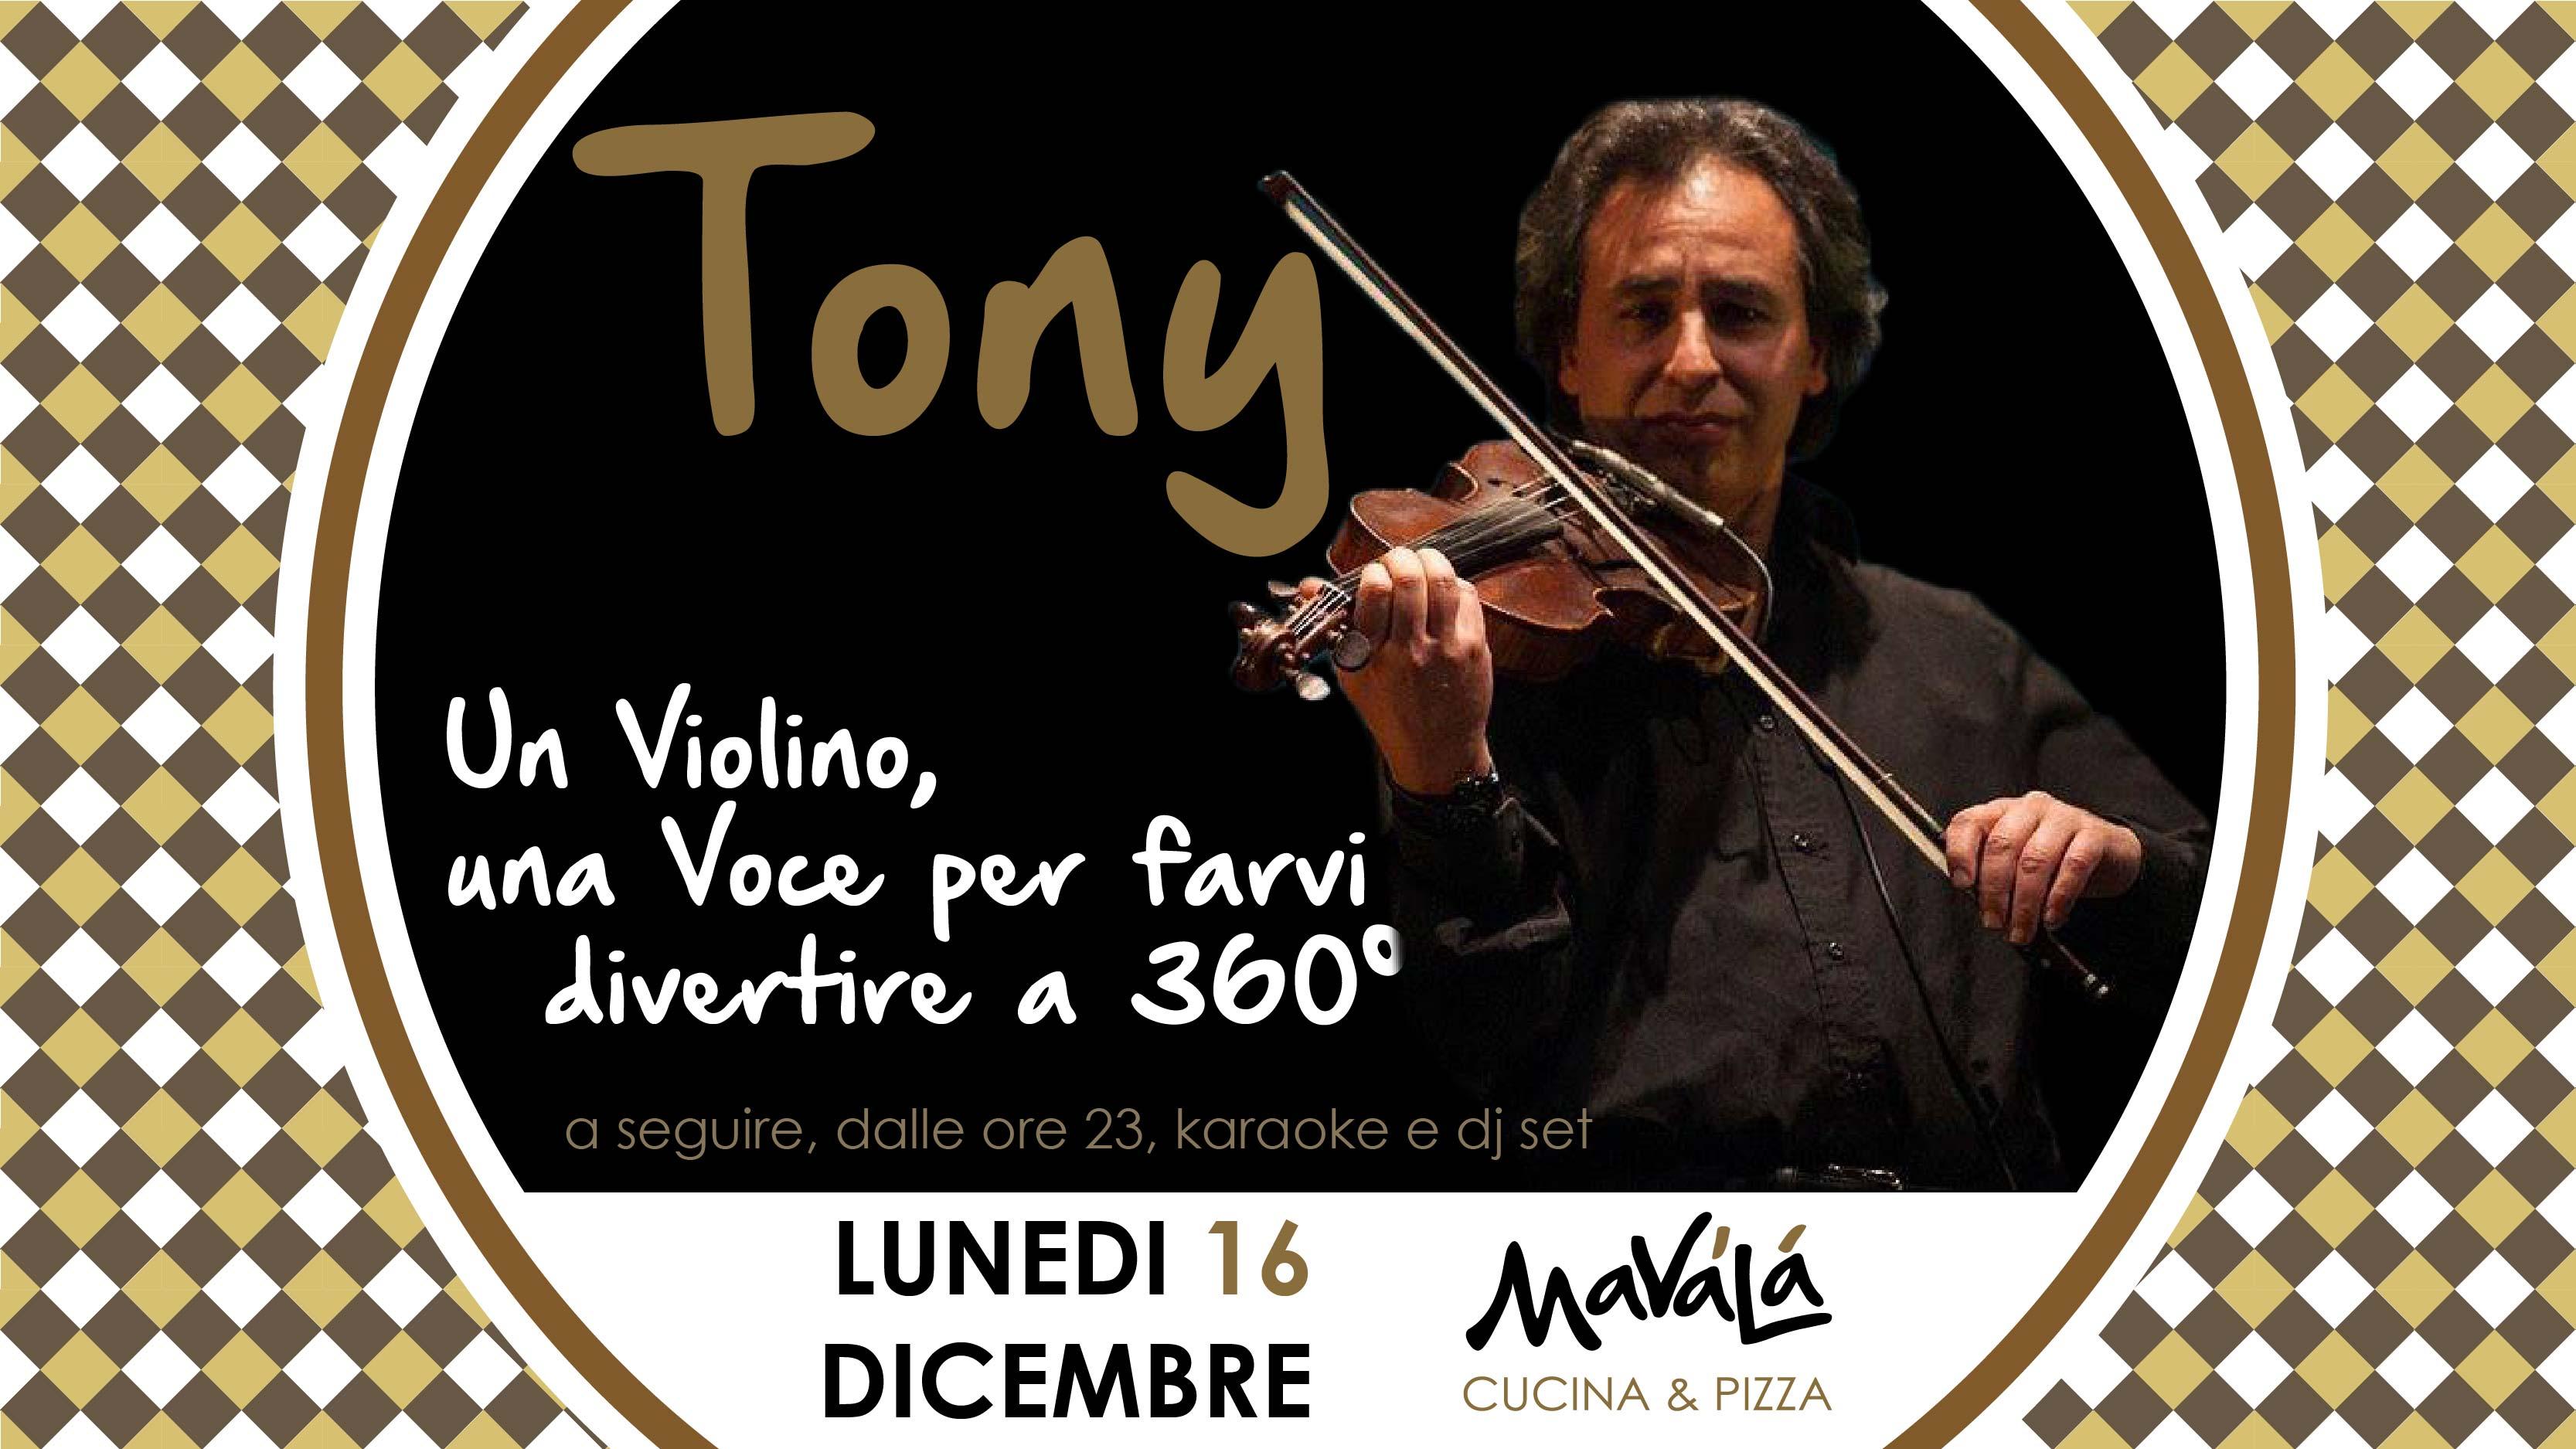 MAVALA_LOCANDINE_DICEMBRE_16_TONY_OK_-04